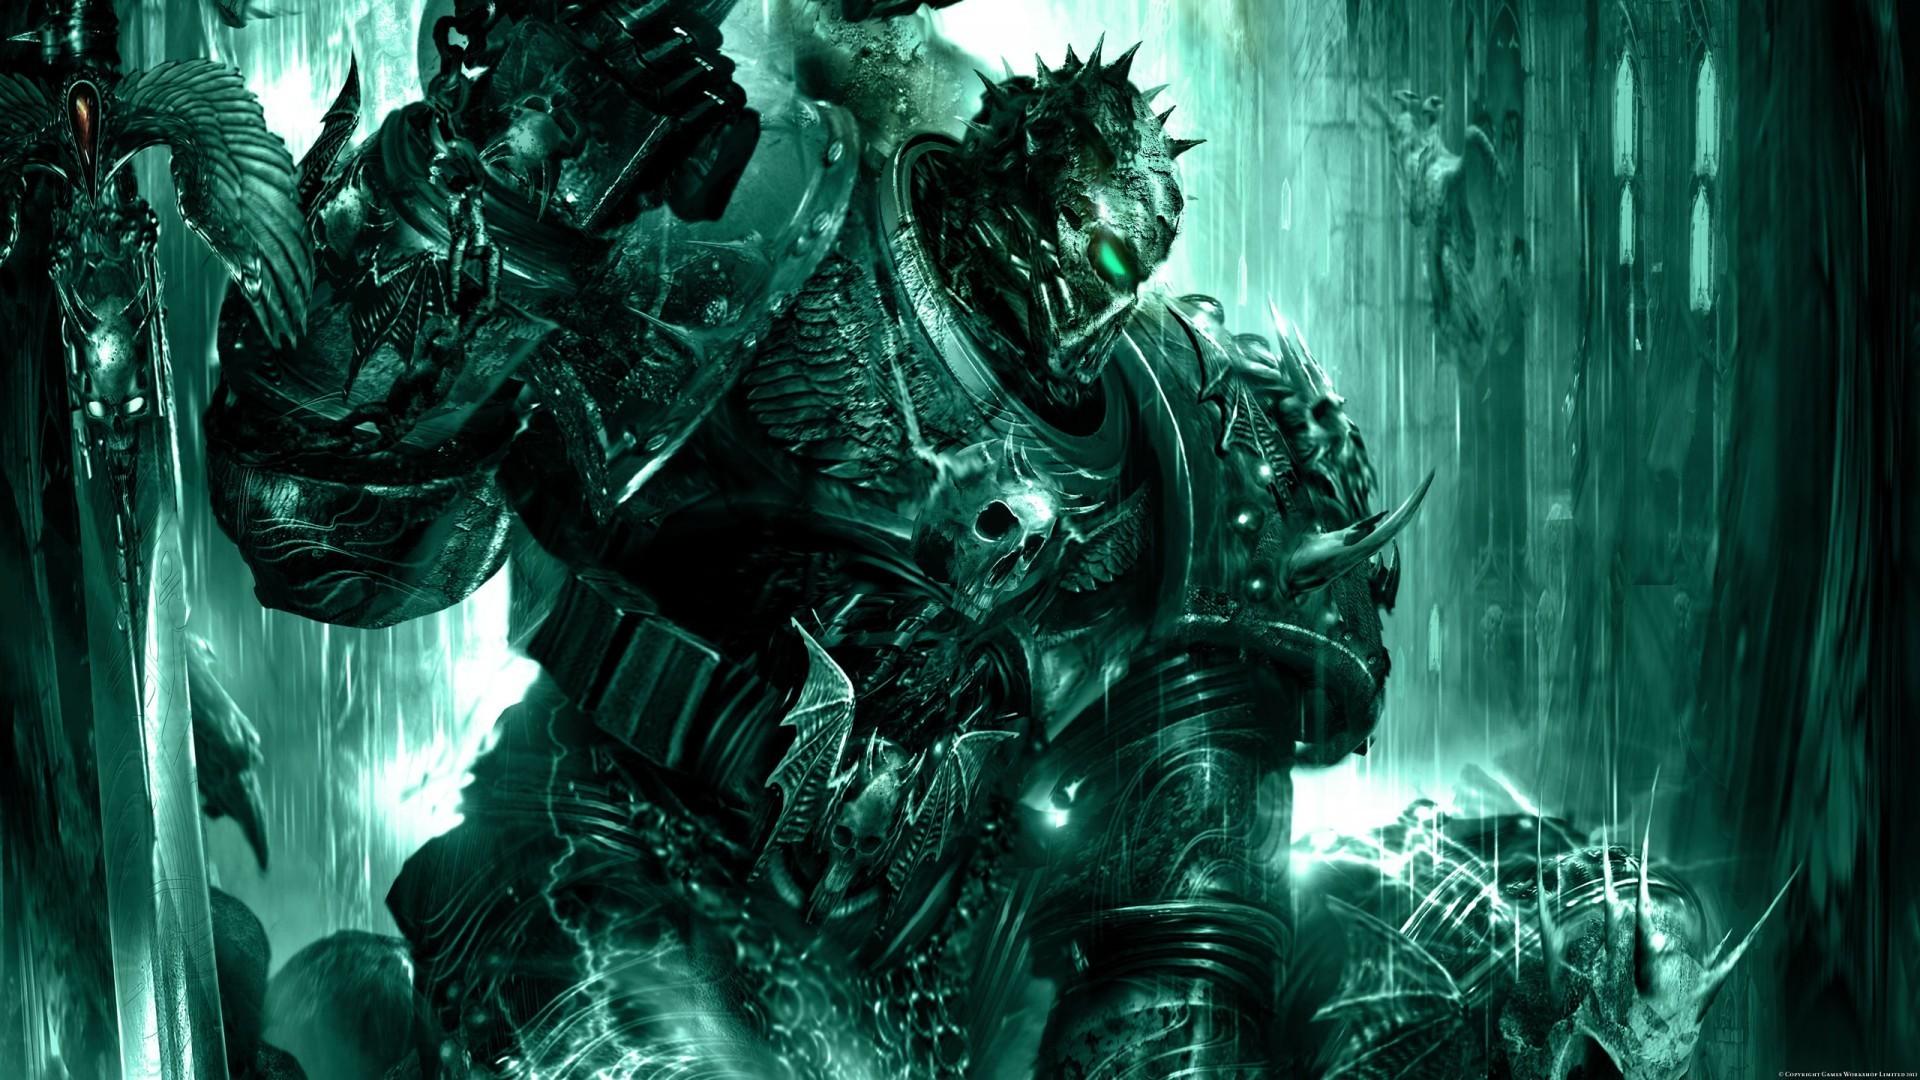 HD-wallpaper-Otife-Warhammer-40k -Fantasy-Art-Artwork-Chaos-Space-Marine-Soul-Hunter-Talos-Hd-Wallpaper-.jpg